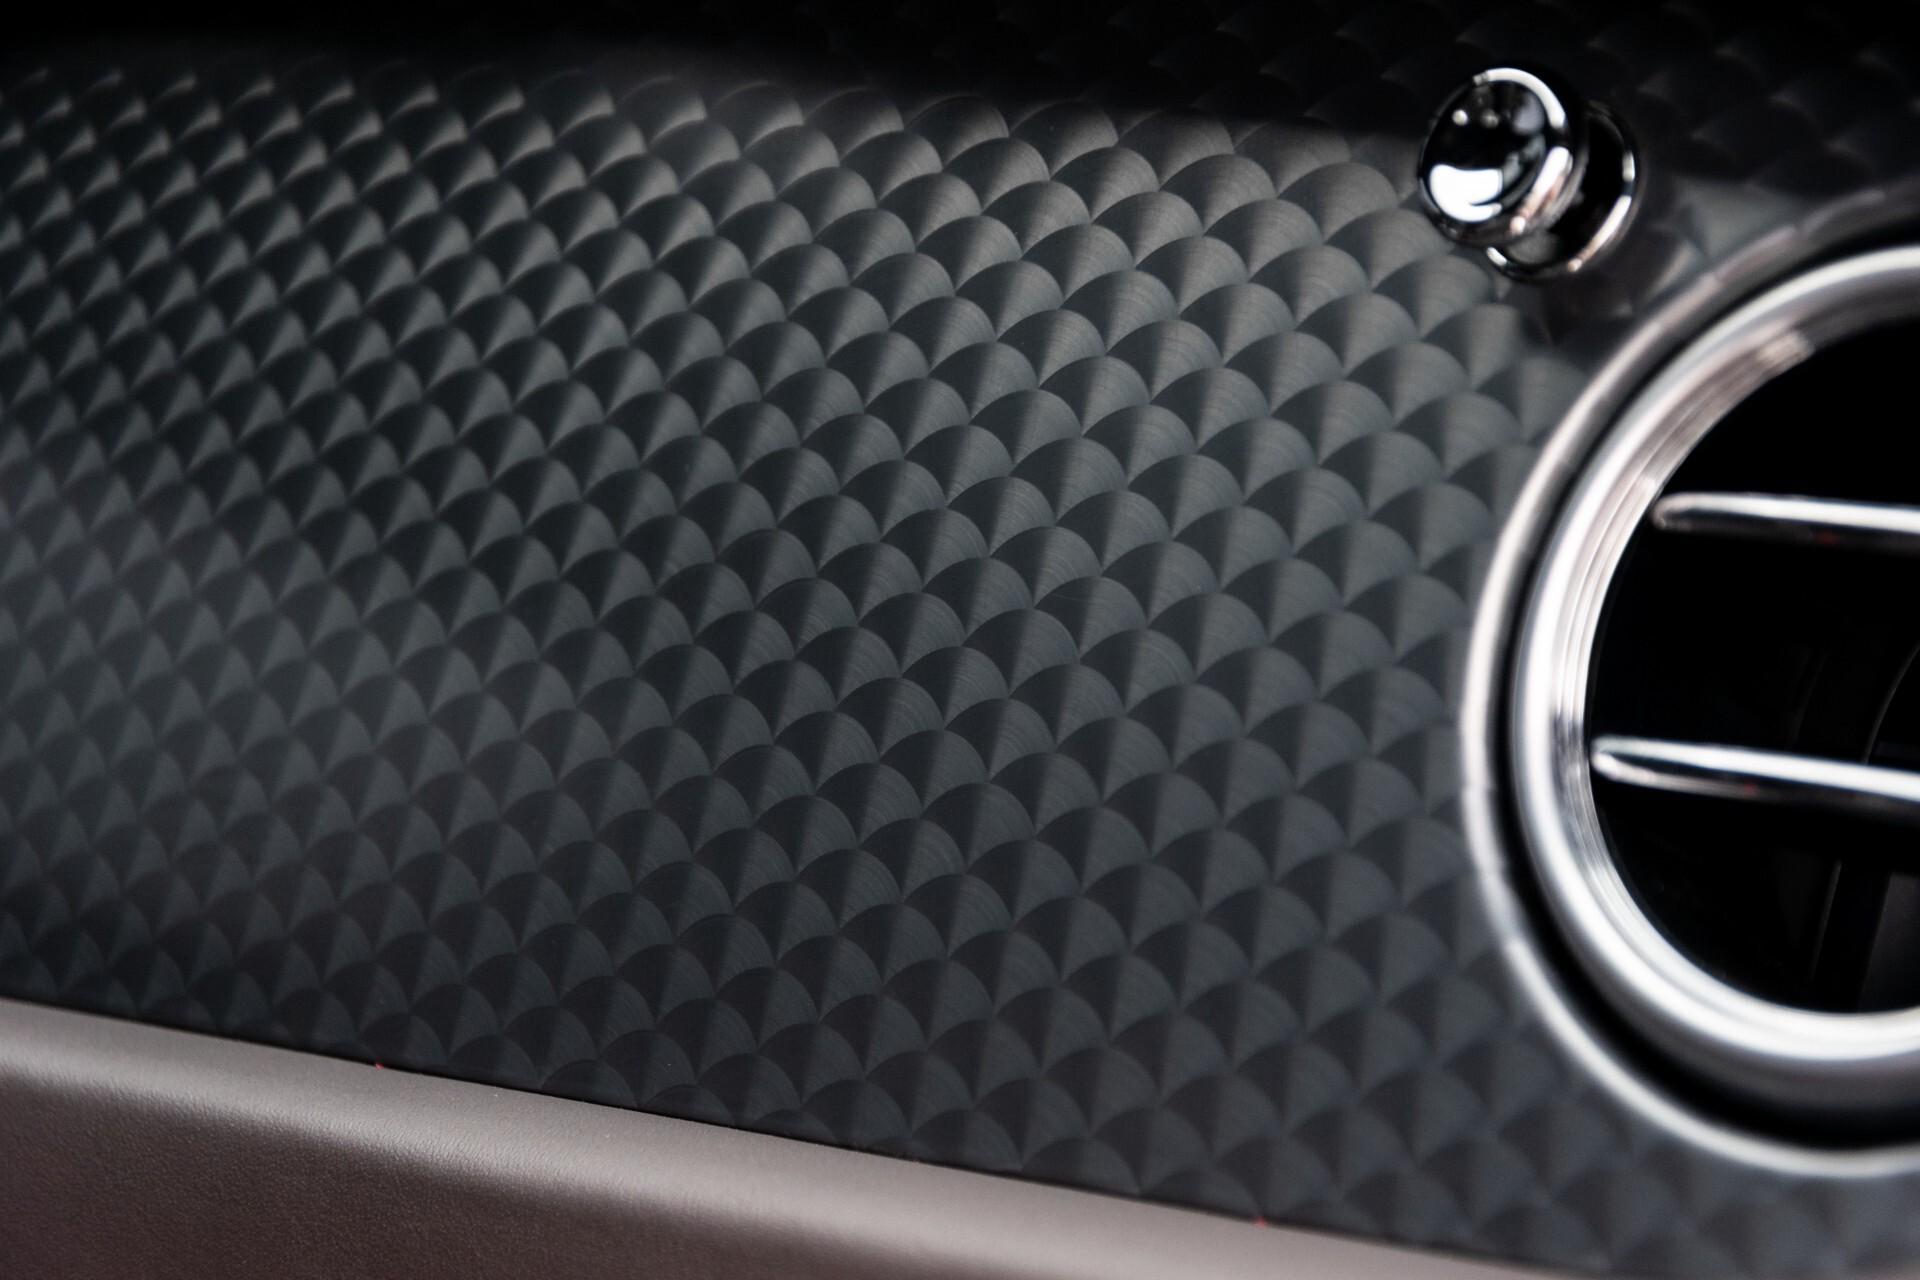 Bentley Continental GT 6.0 W12 GT Speed Ceramic Brakes/Mulliner/Standkachel/Keyless Aut6 Foto 50